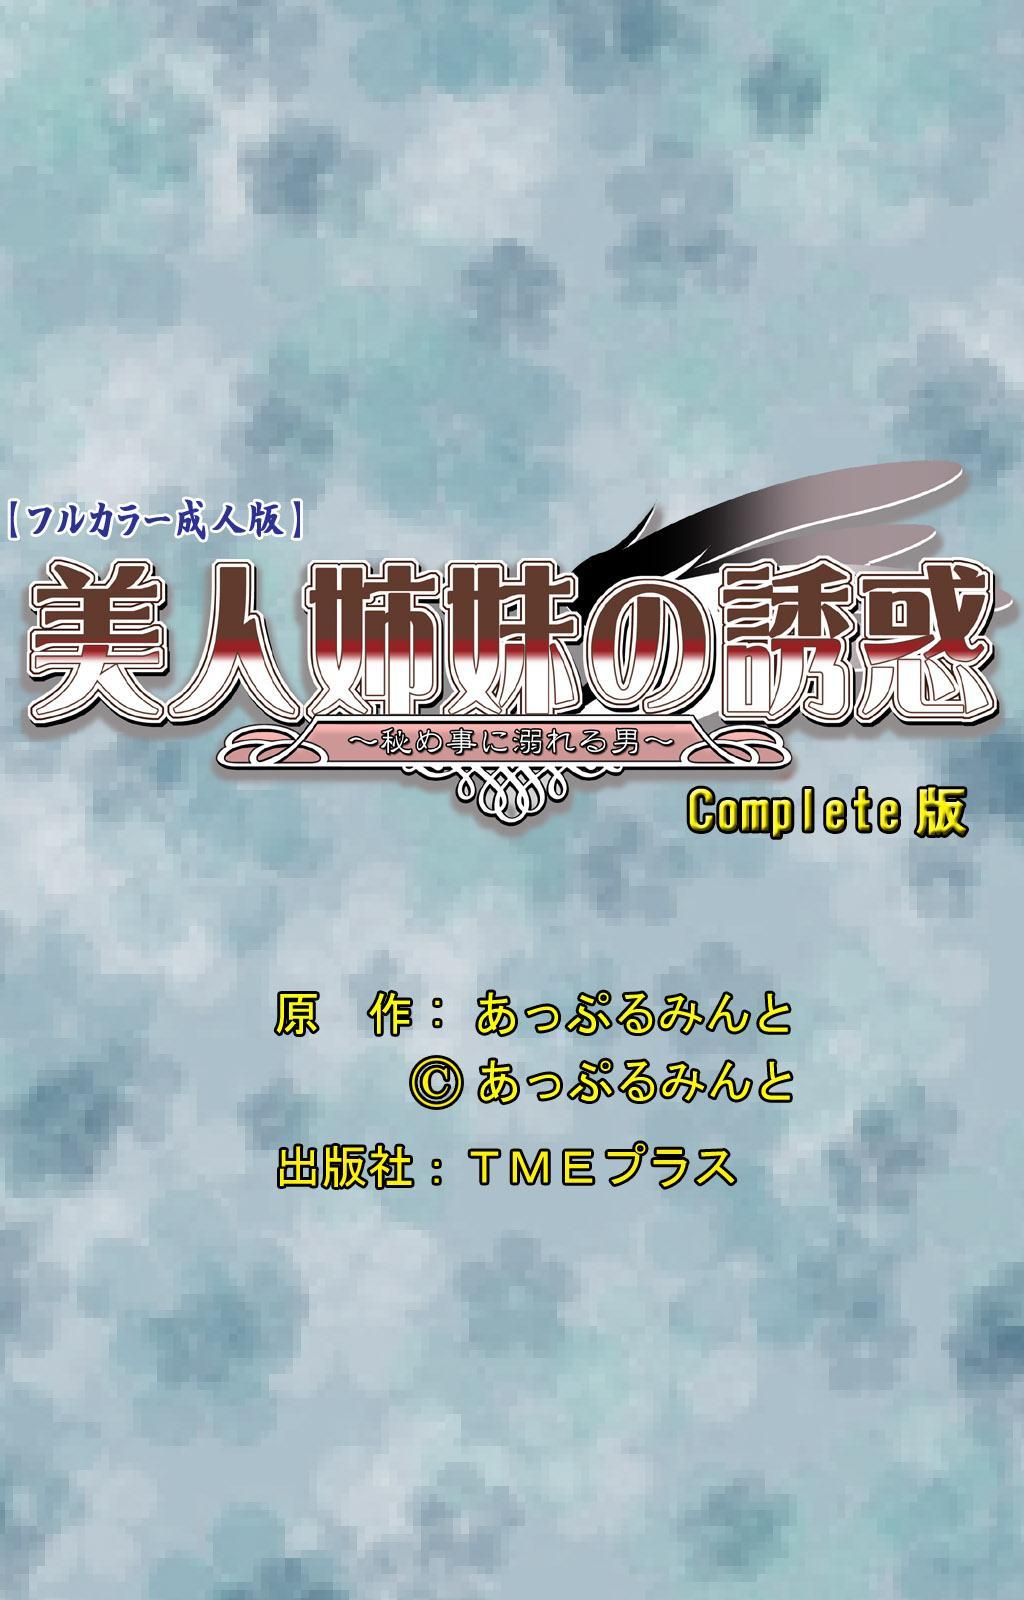 [Applemint] [Full Color seijin ban] Bijin shimai no yuwaku ~ himegoto ni oboreru otoko ~ Complete ban 98